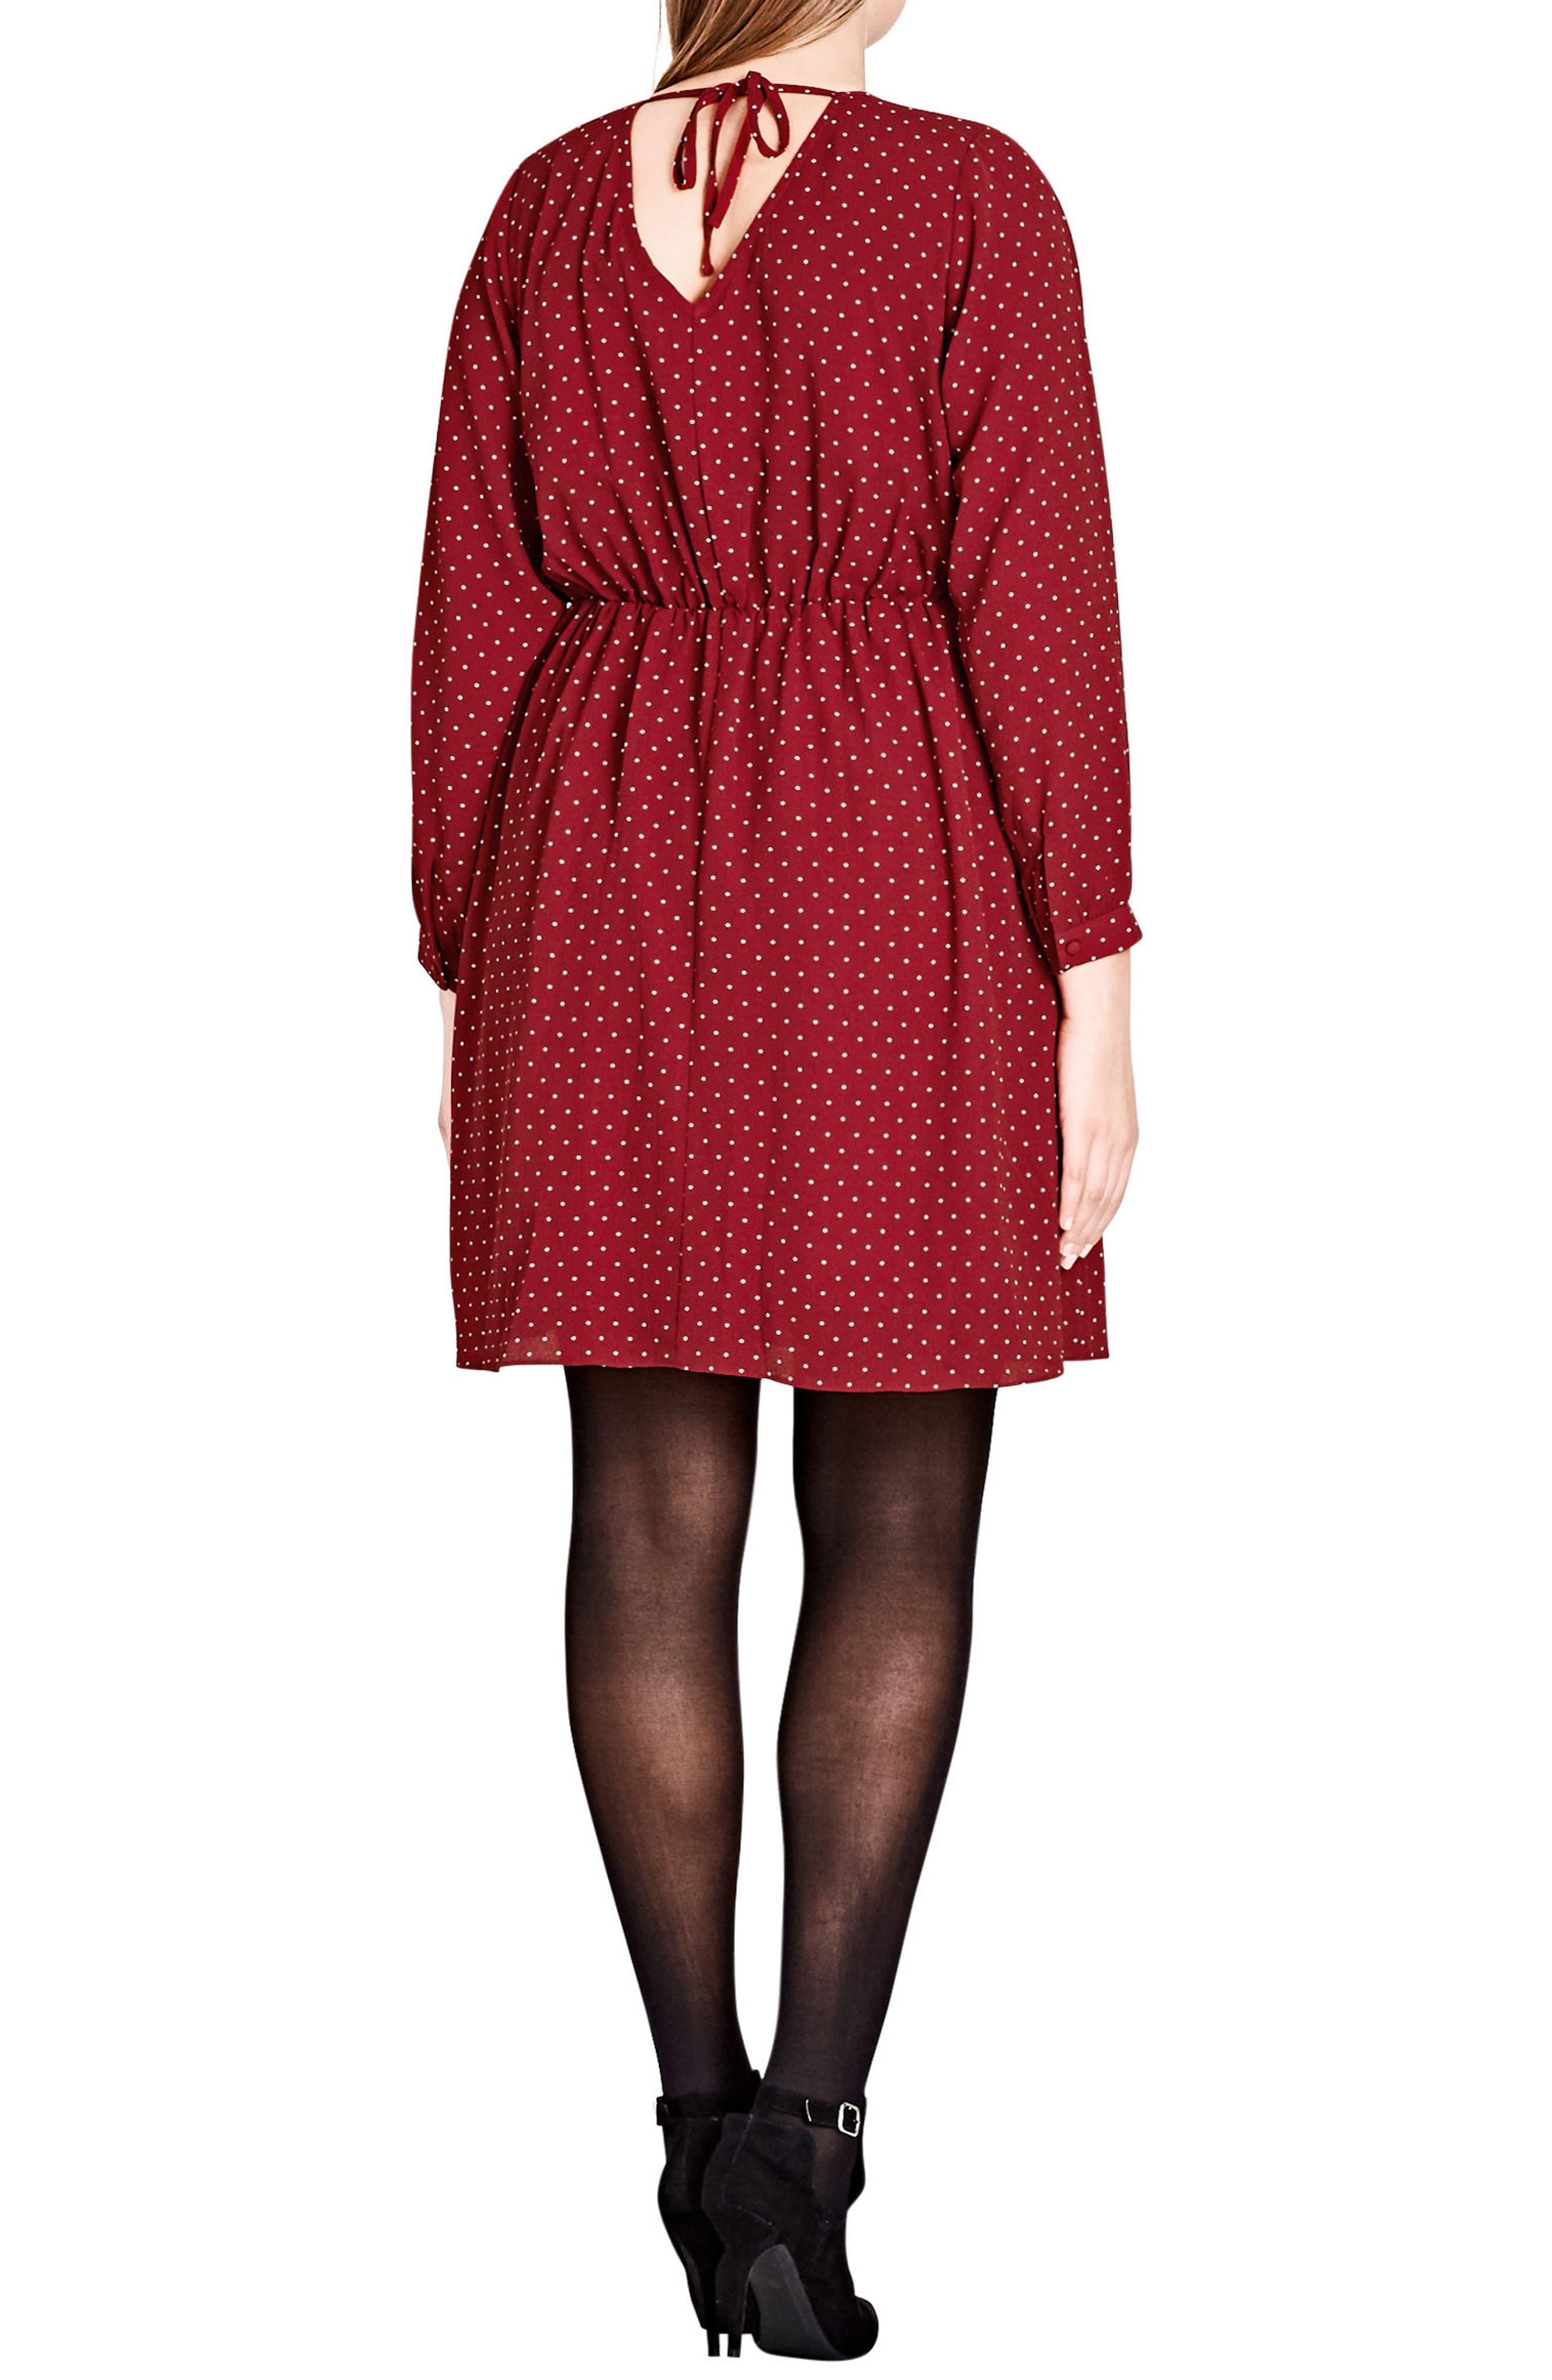 Sweet Nothing Polka Dot Dress,                             Alternate thumbnail 2, color,                             RED ROSE